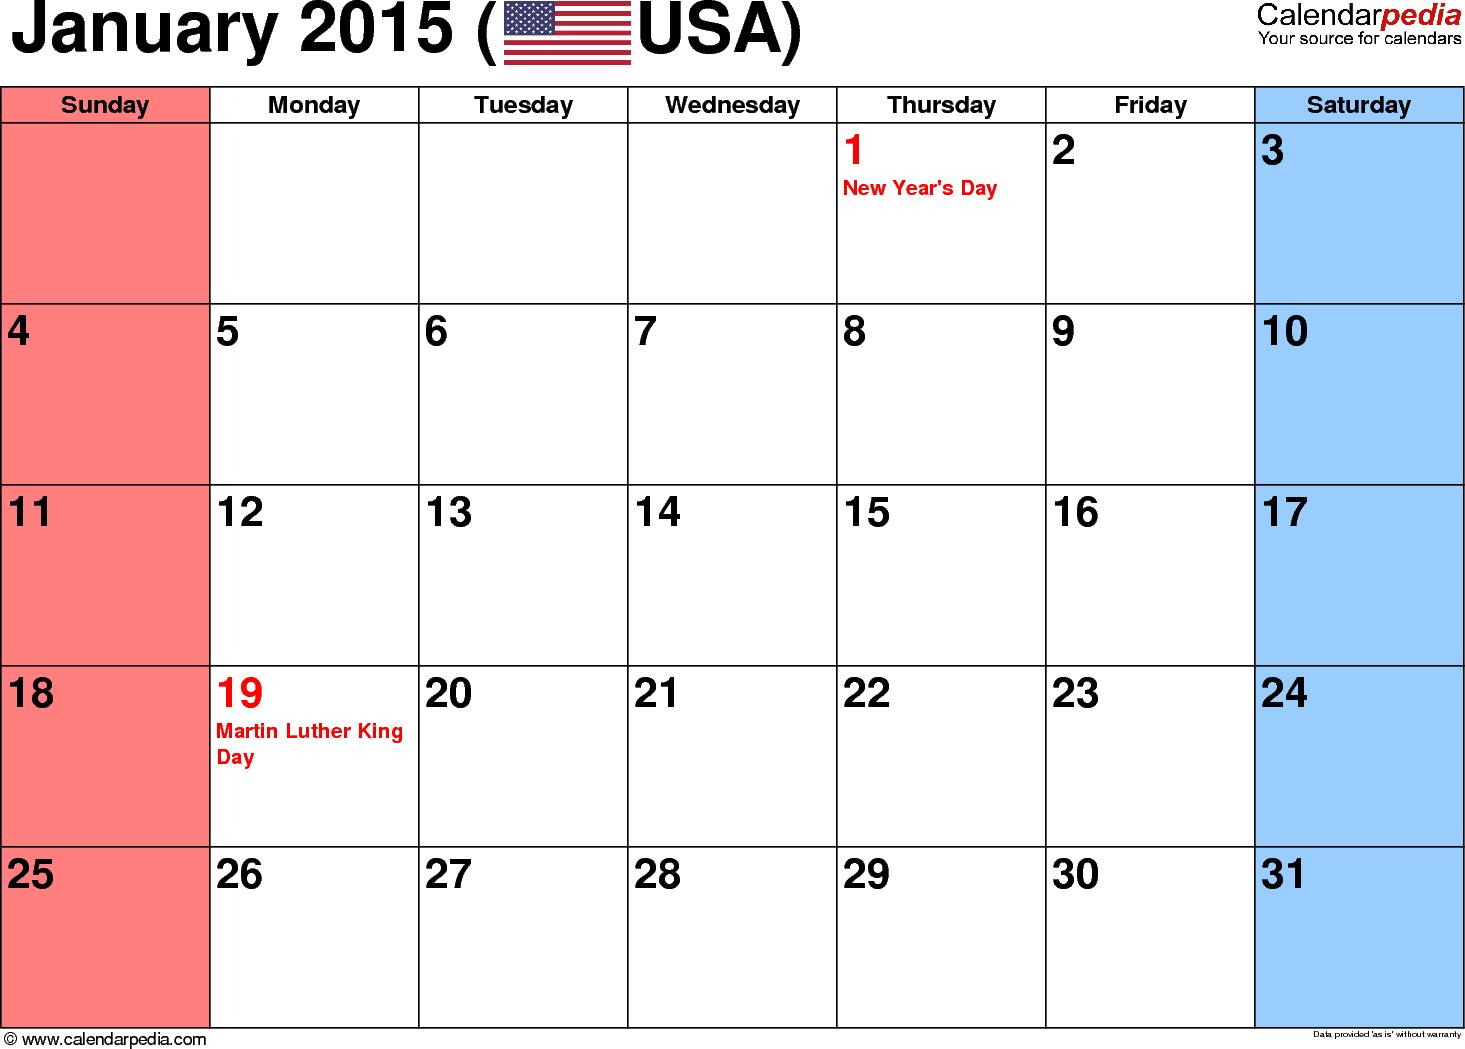 blank january 2015 calendar calendar pinterest calendar free printable calendar and. Black Bedroom Furniture Sets. Home Design Ideas